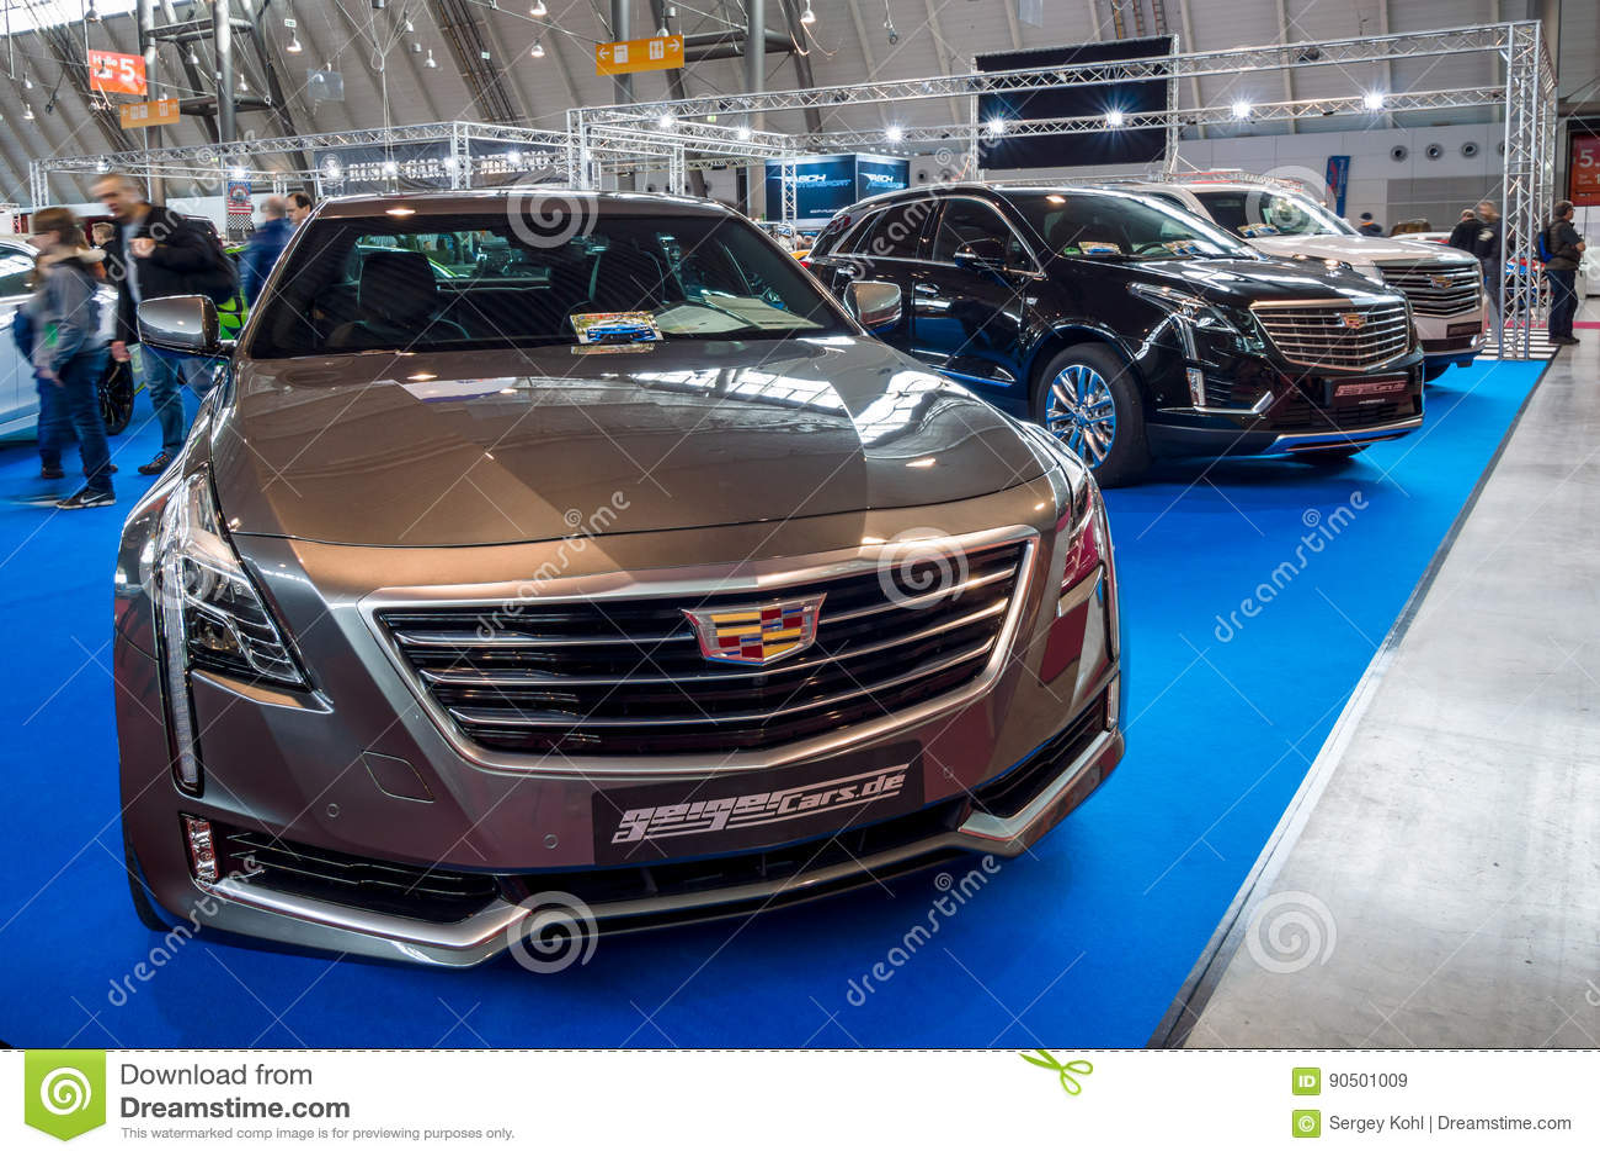 Full-size Luxury Car Cadillac CT6 AWD, 2016  Editorial Stock